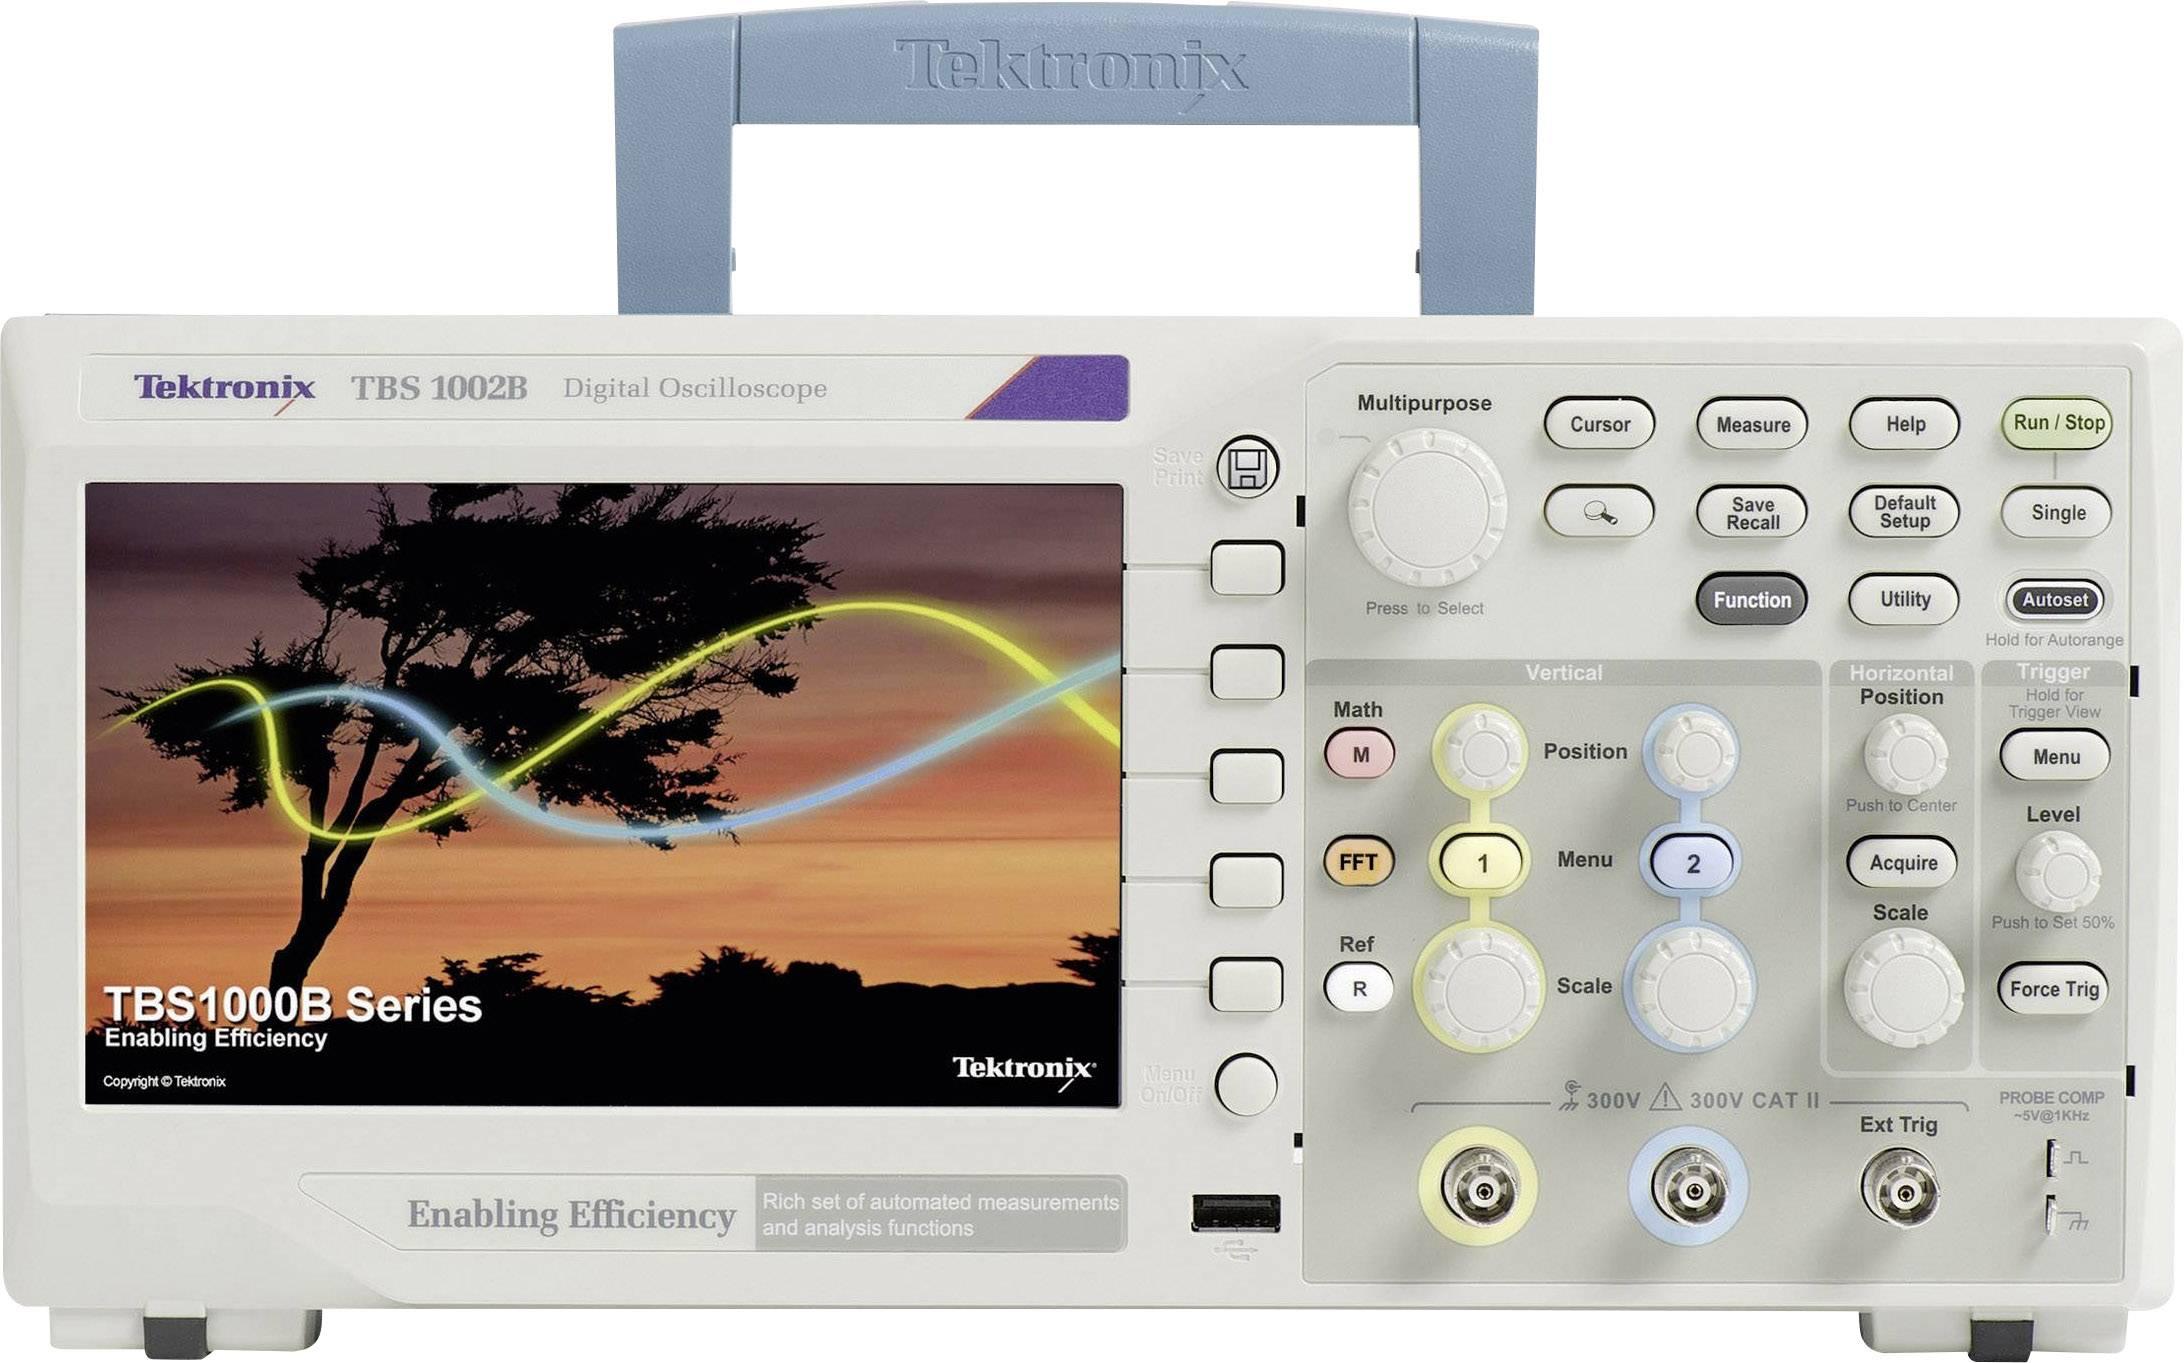 Digitálny osciloskop Tektronix TBS1052B, 50 MHz, 2-kanálový, kalibrácia podľa ISO